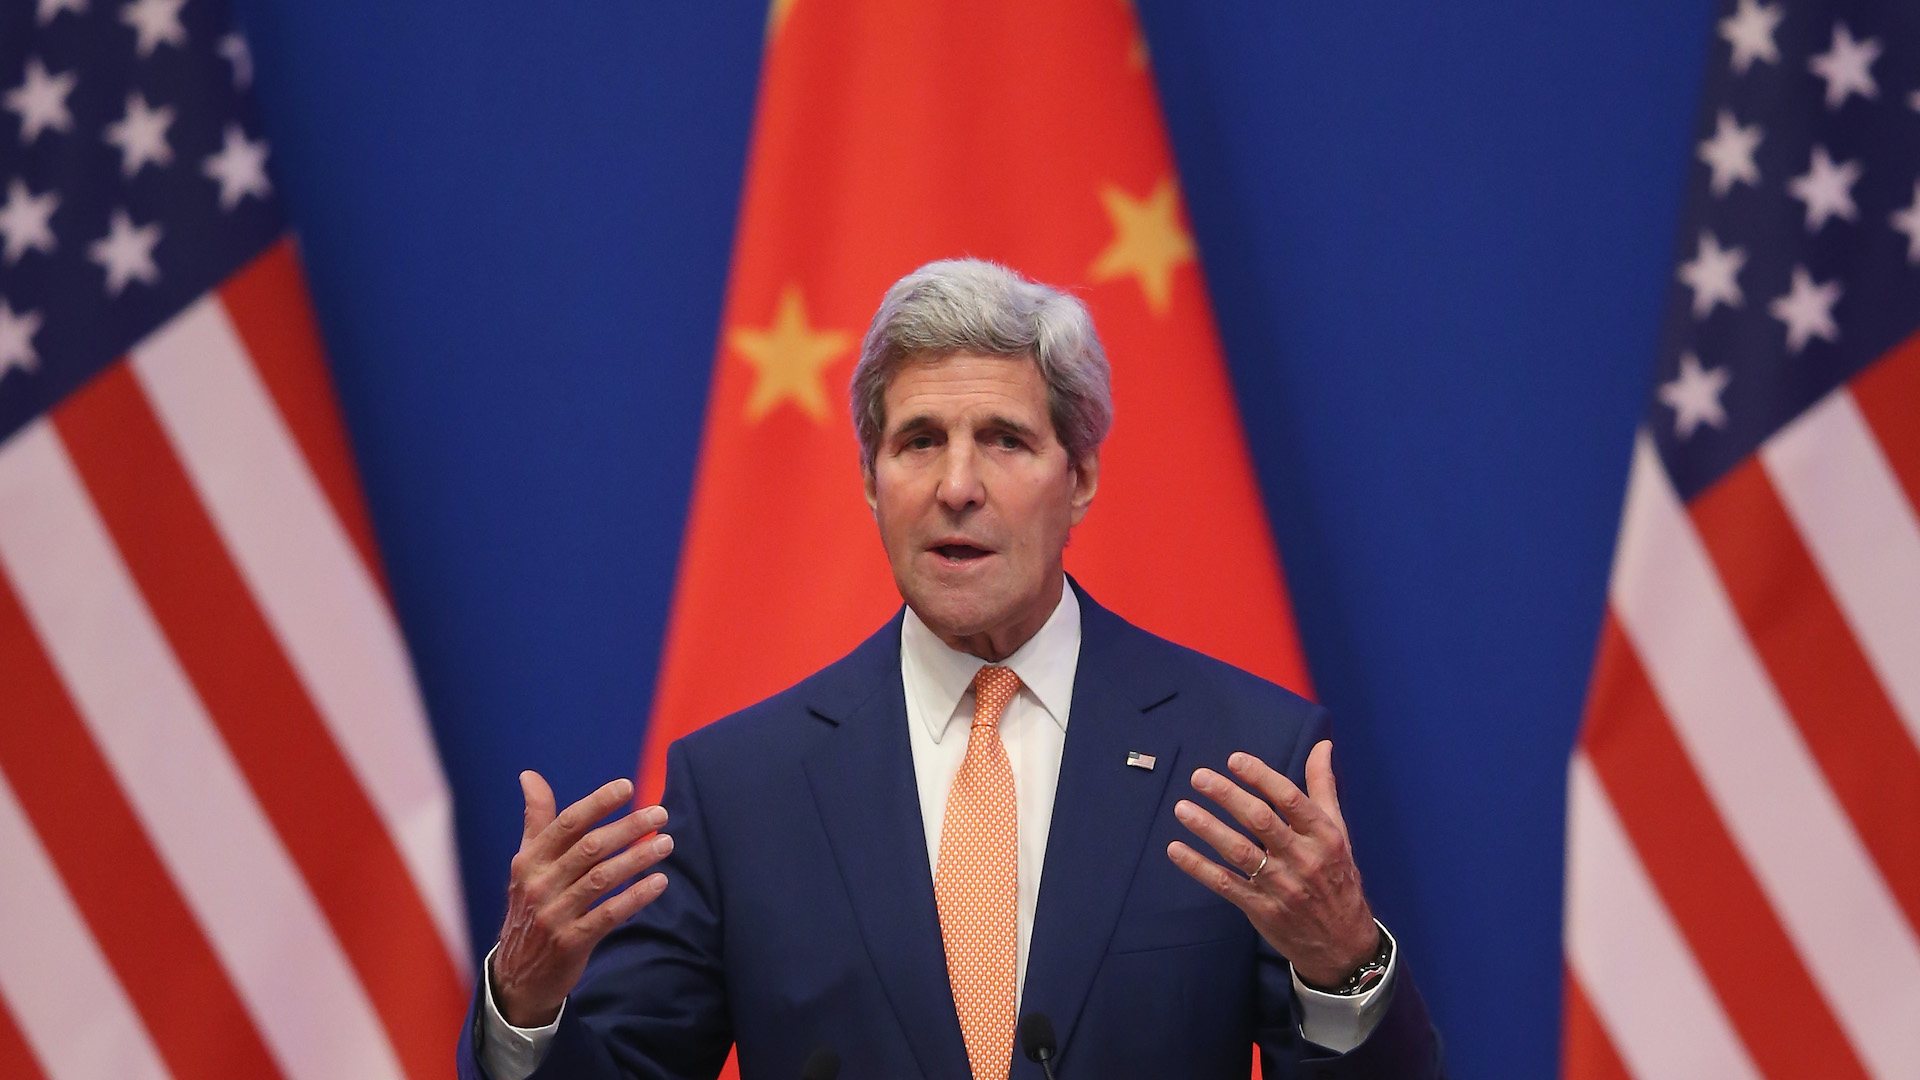 Summit tra Stati Uniti e Cina